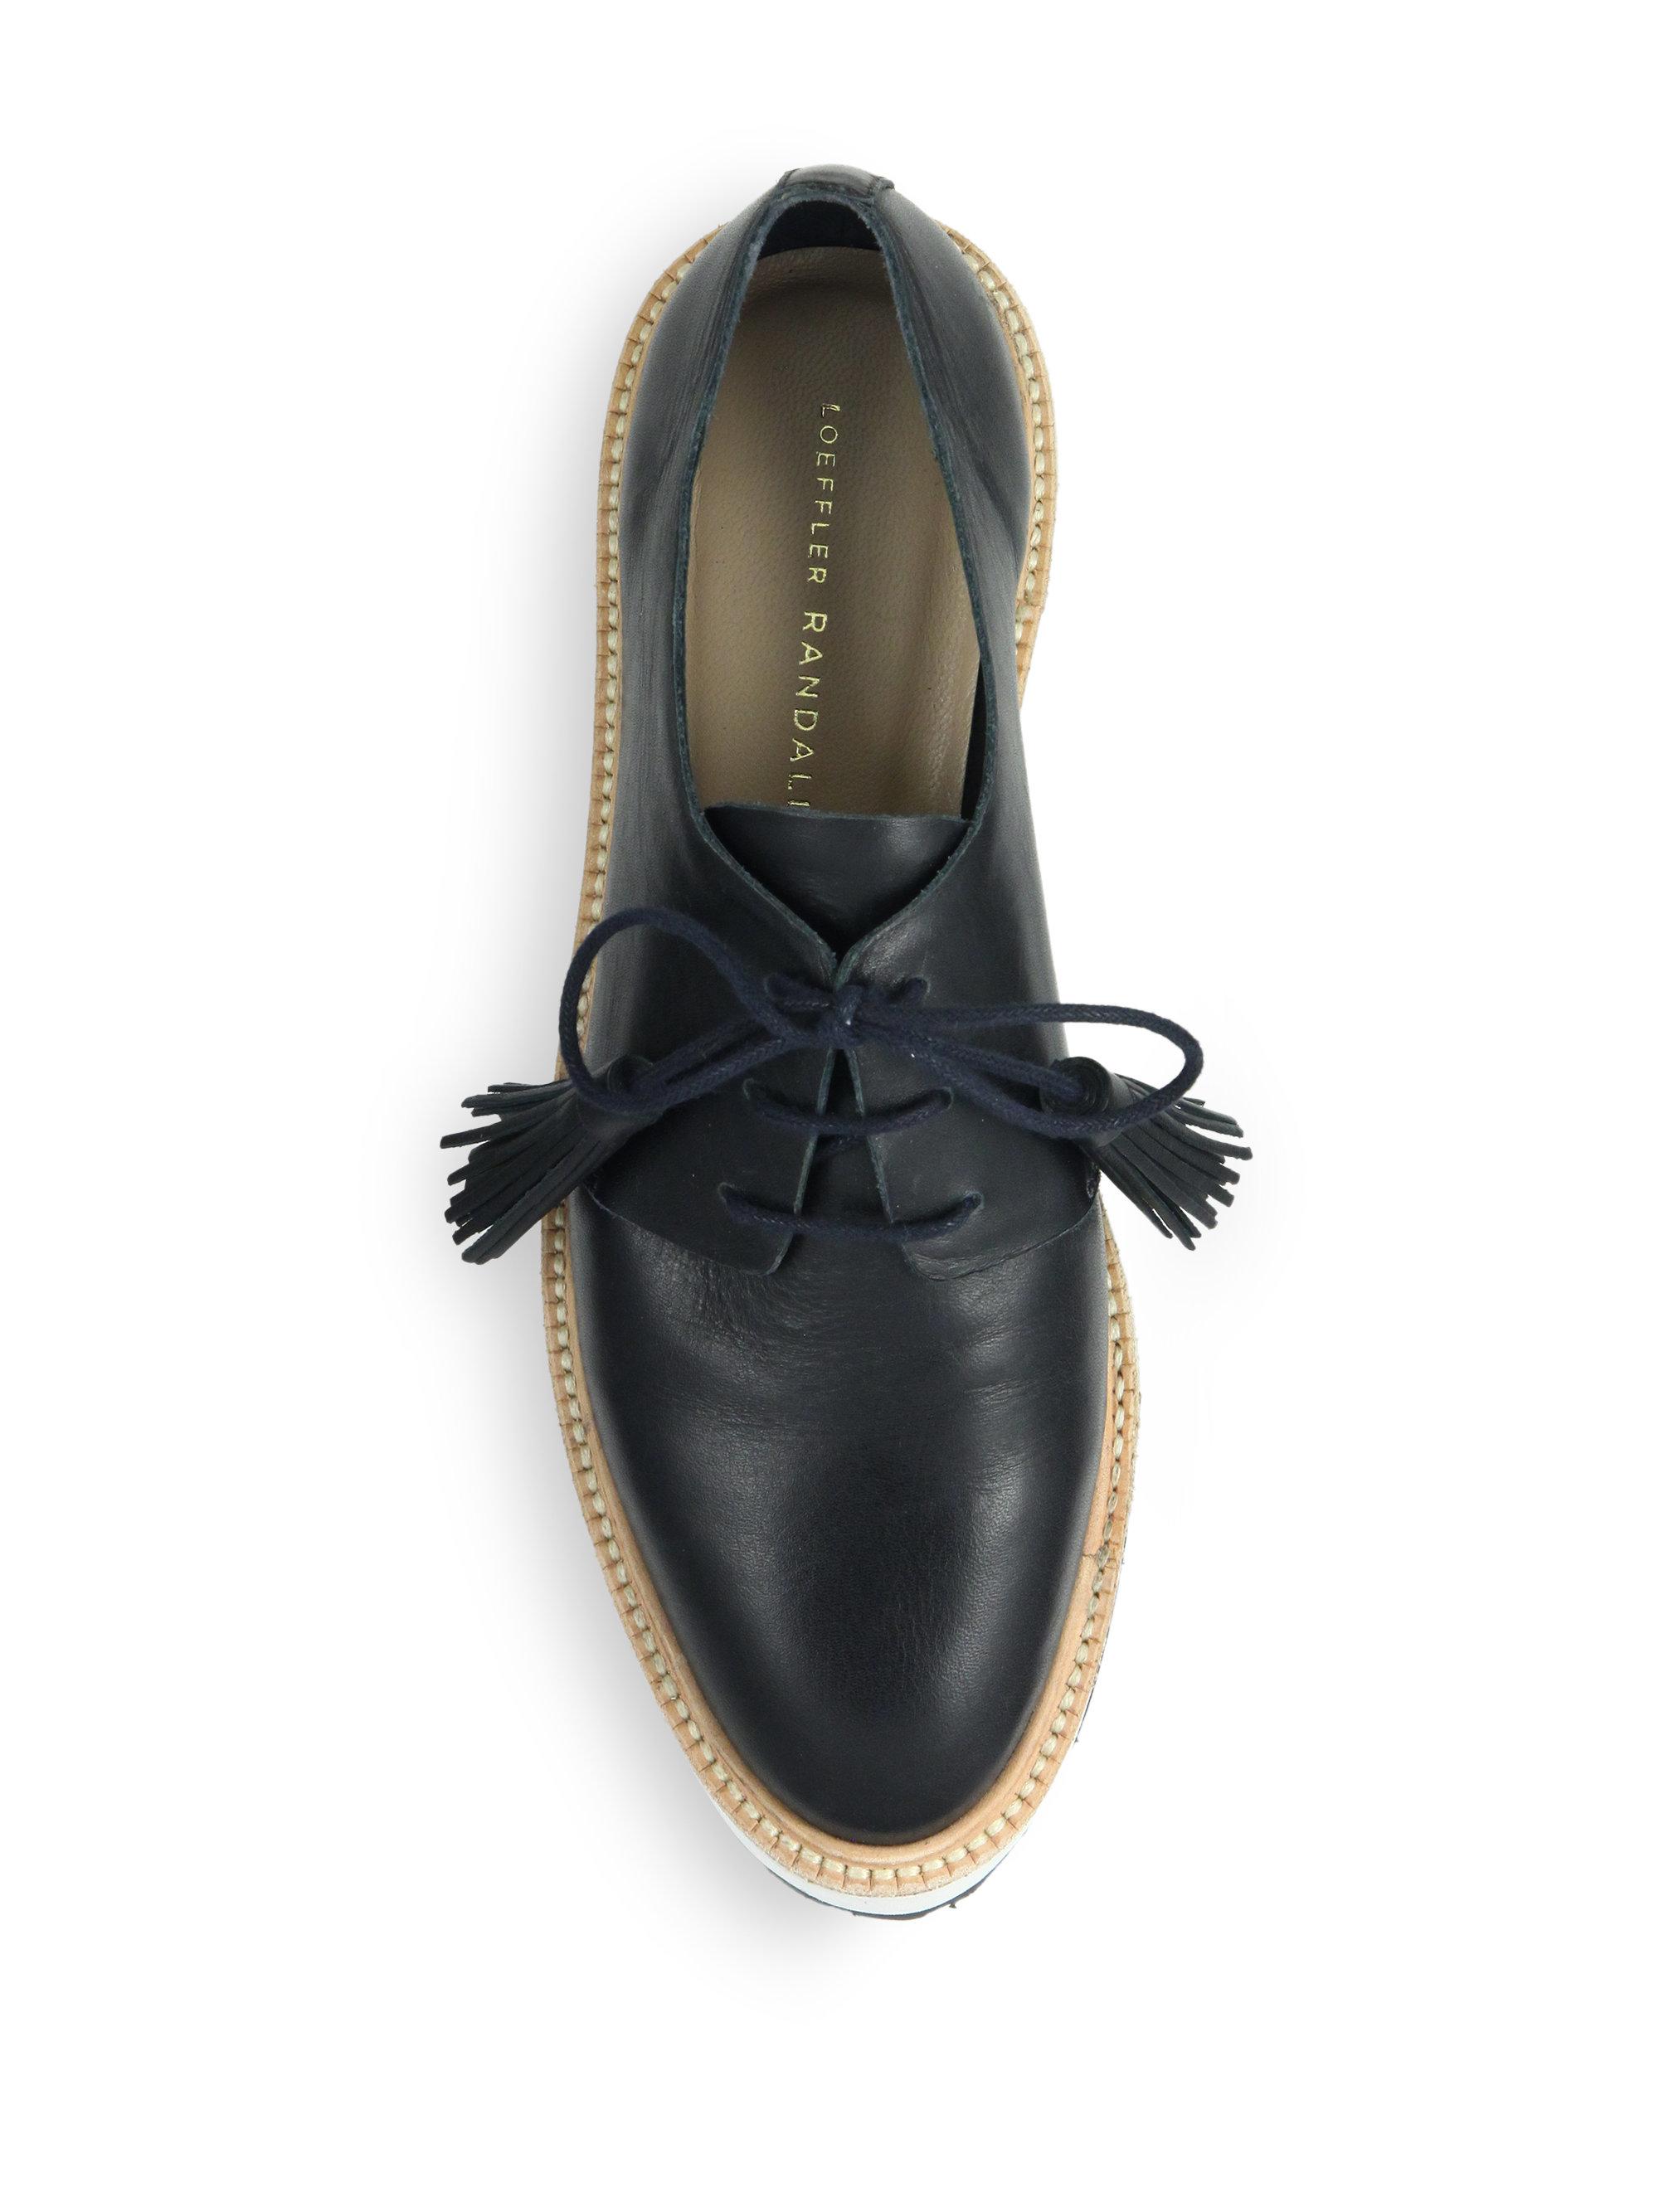 5825f39ac Loeffler Randall Callie Leather Platform Oxfords in Black - Lyst